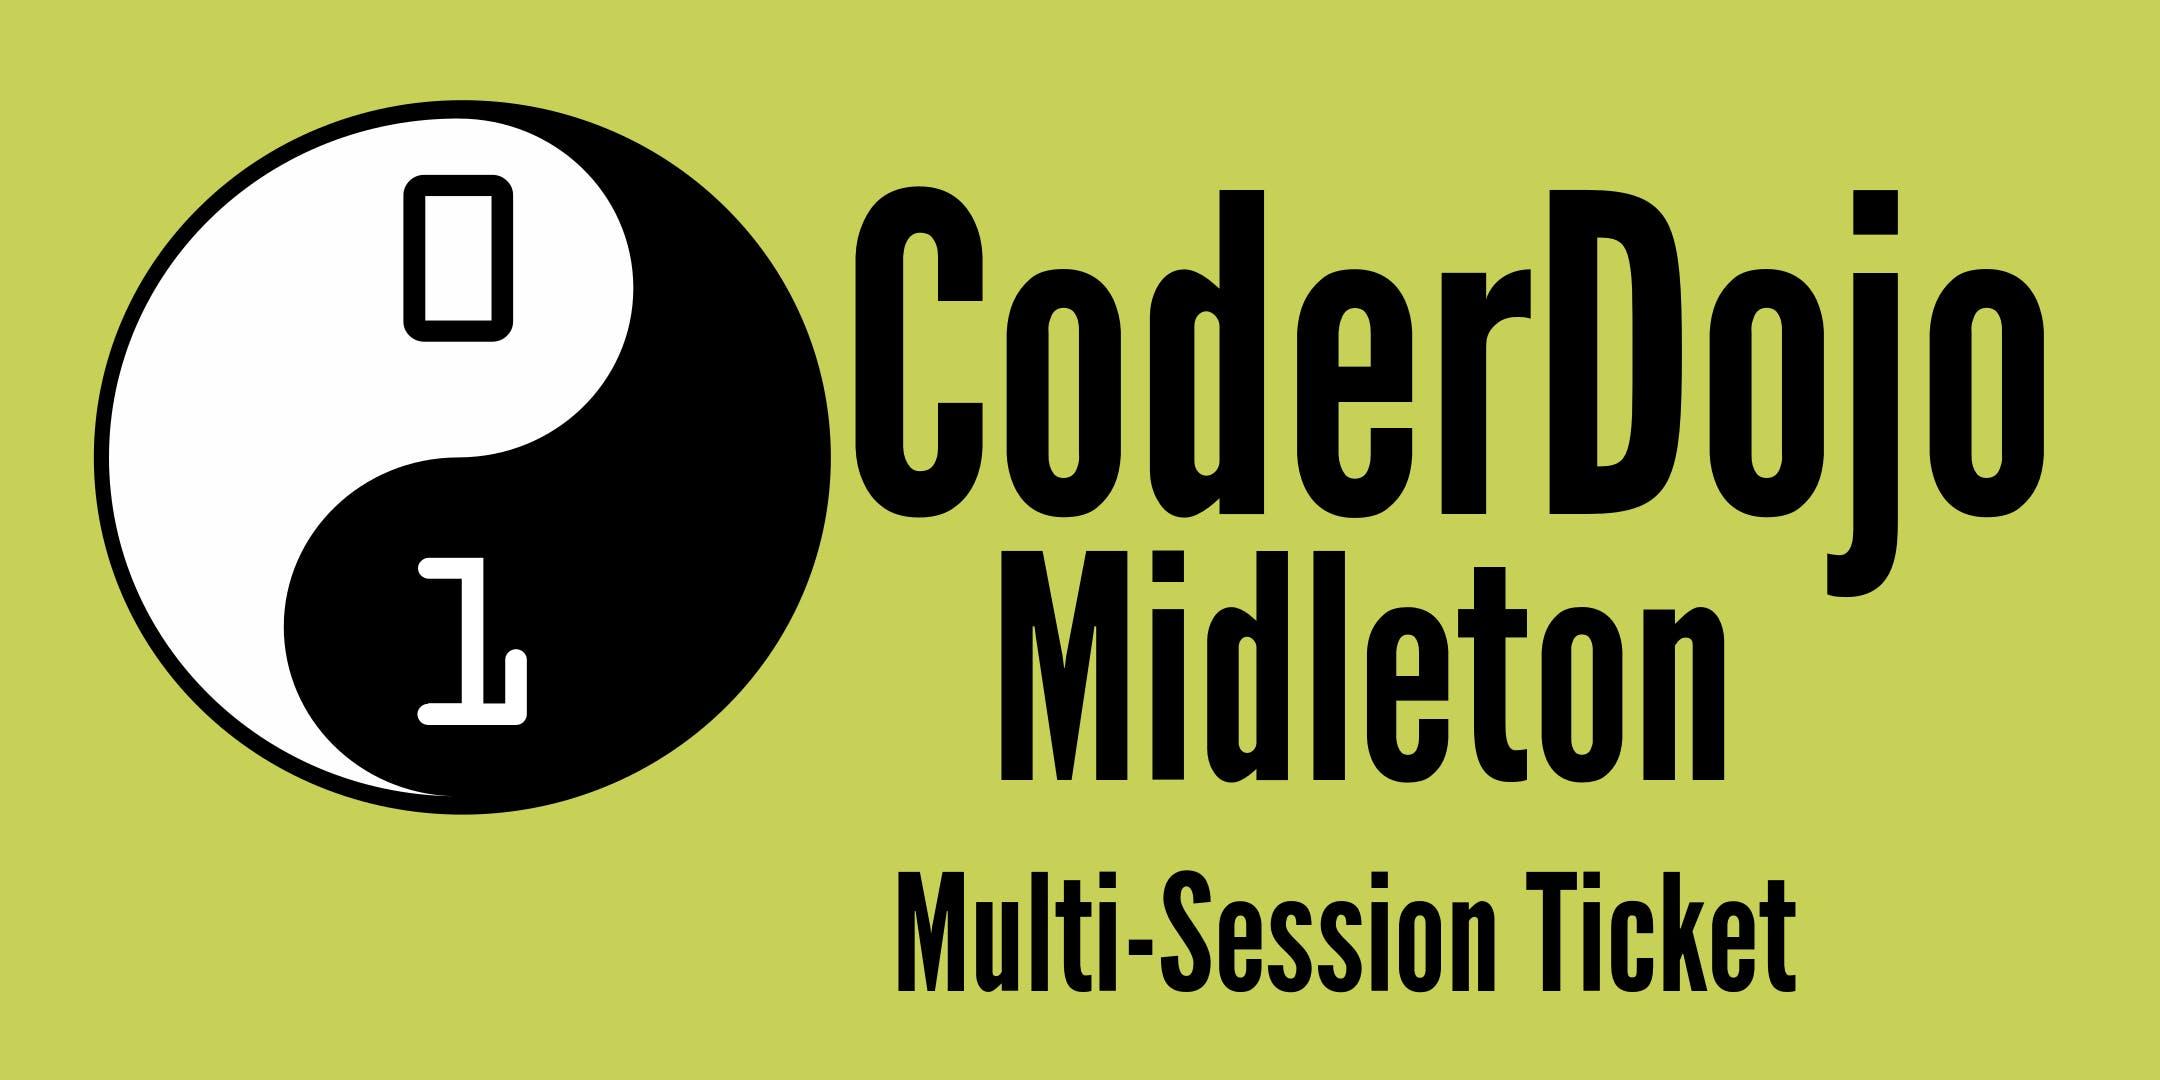 CoderDojo Midleton - Multiple-Session Ticket